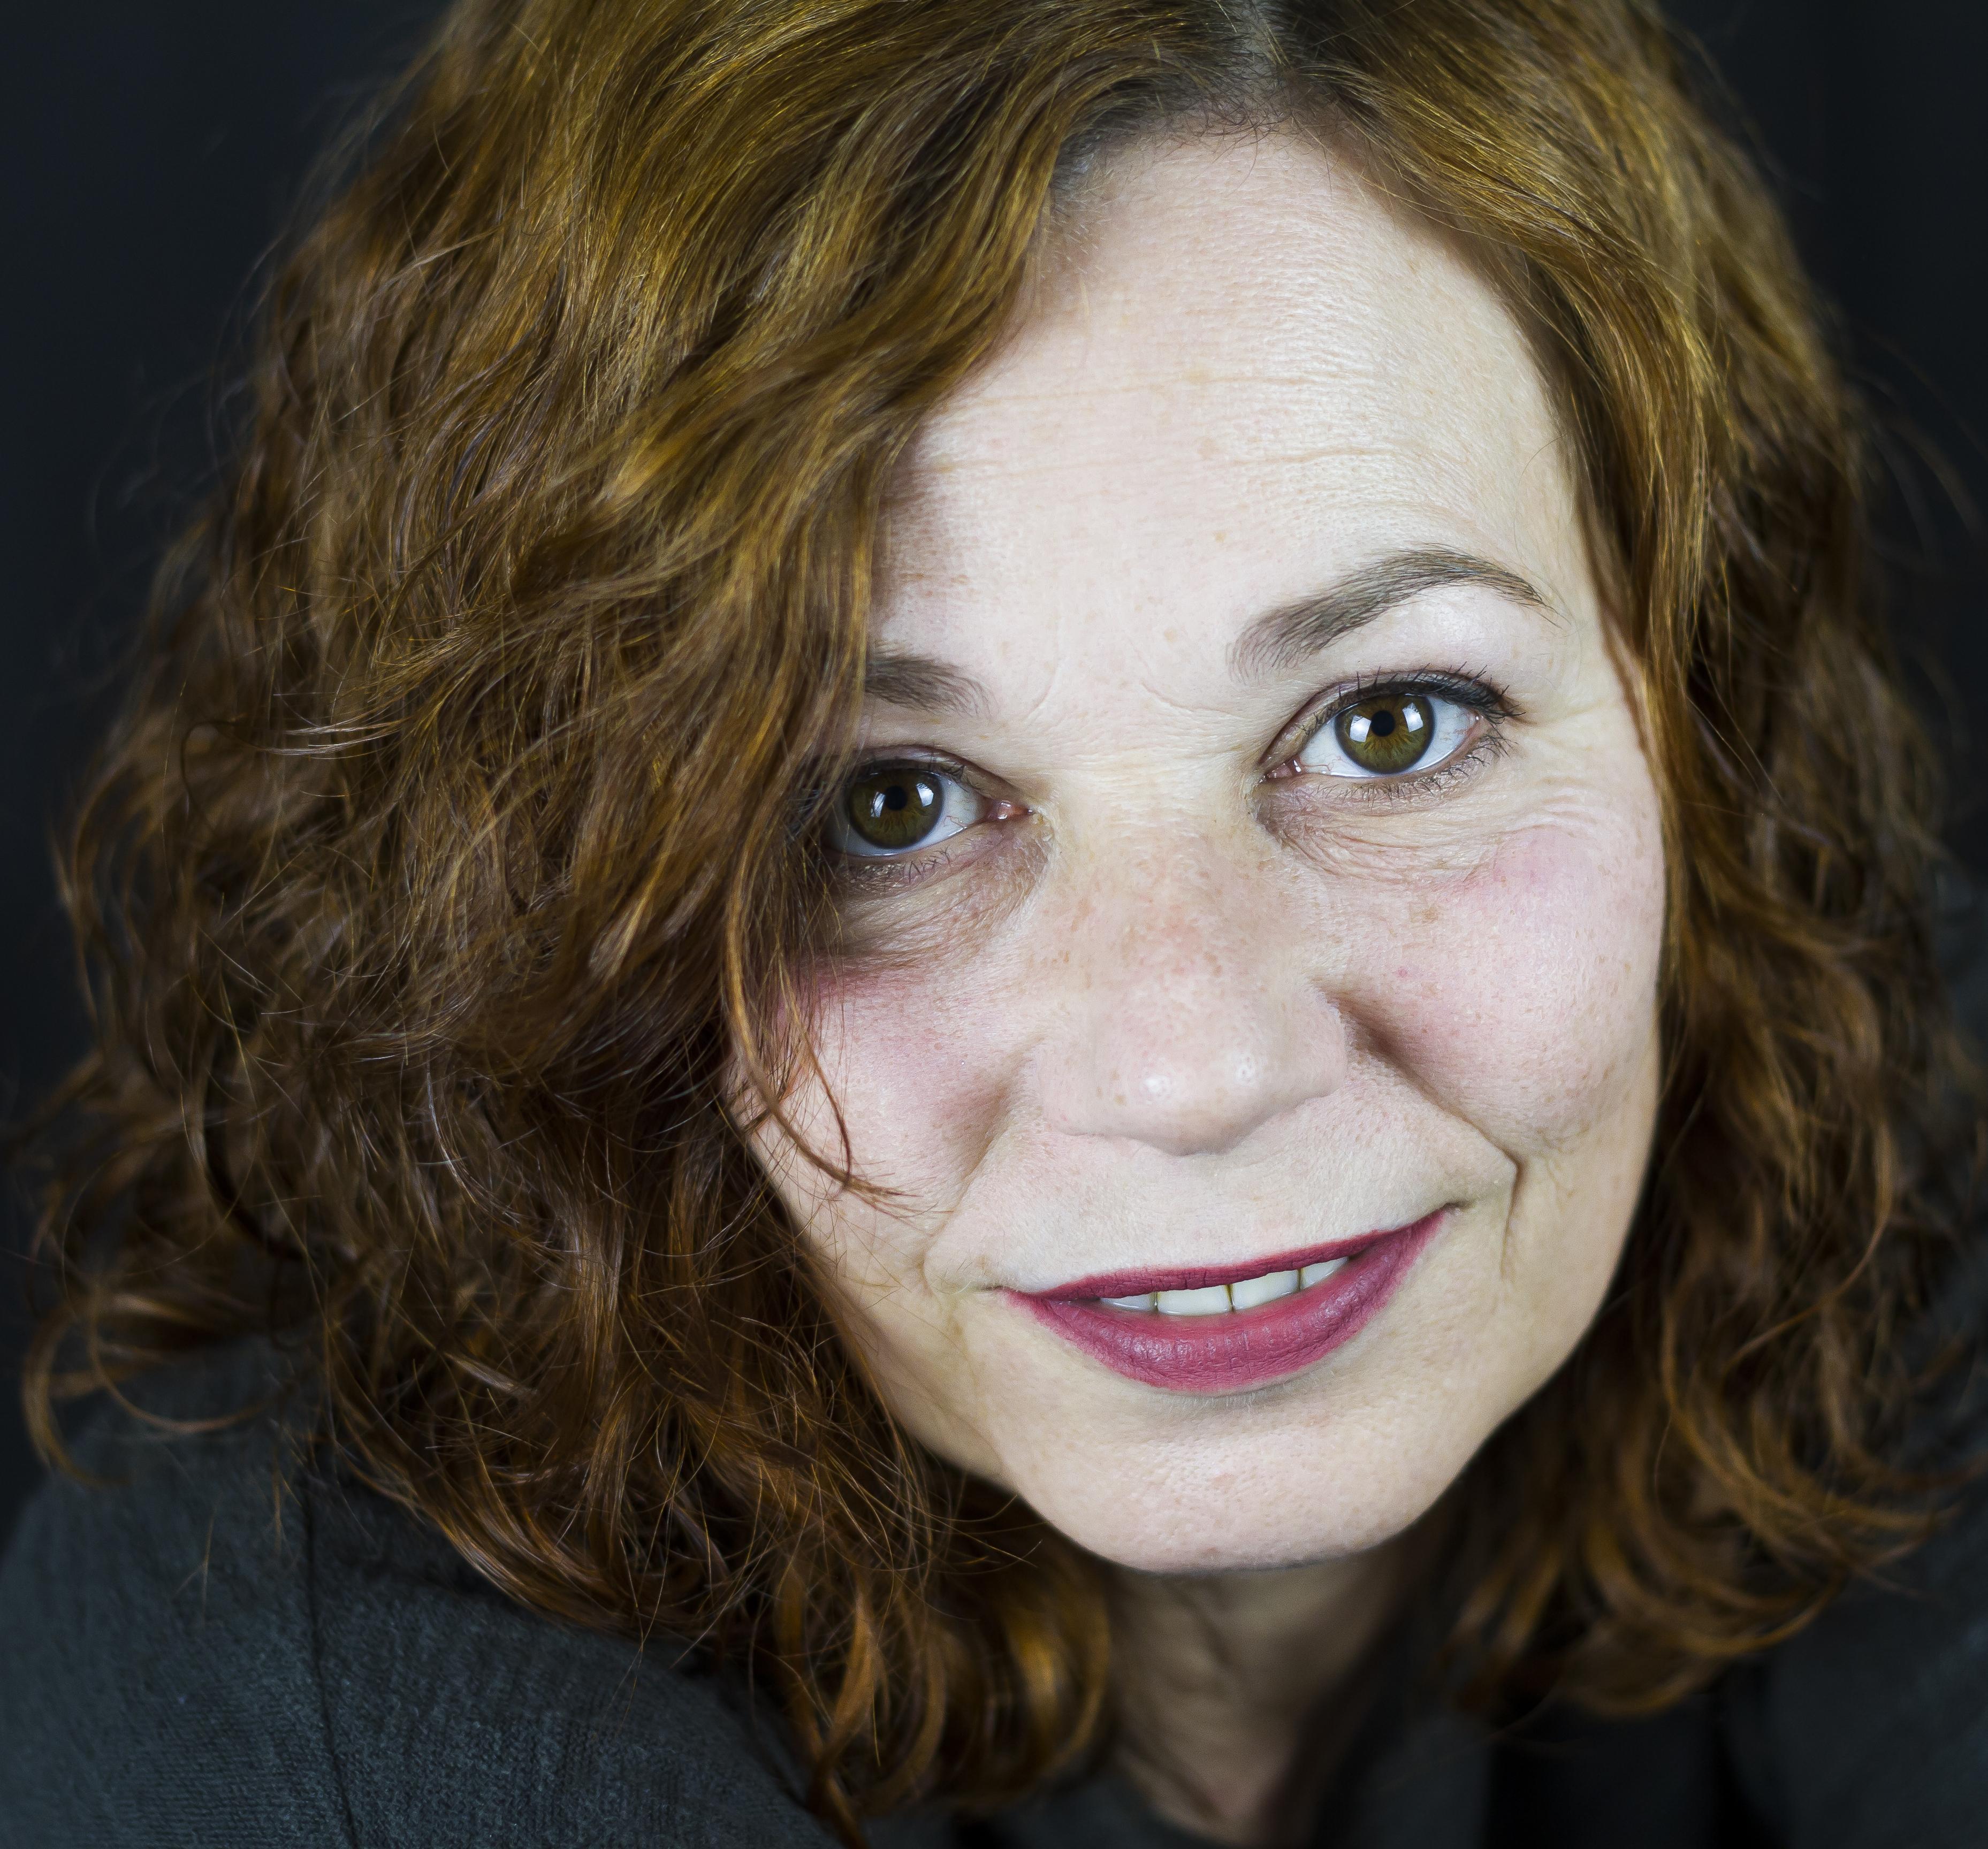 Angela Oberthür